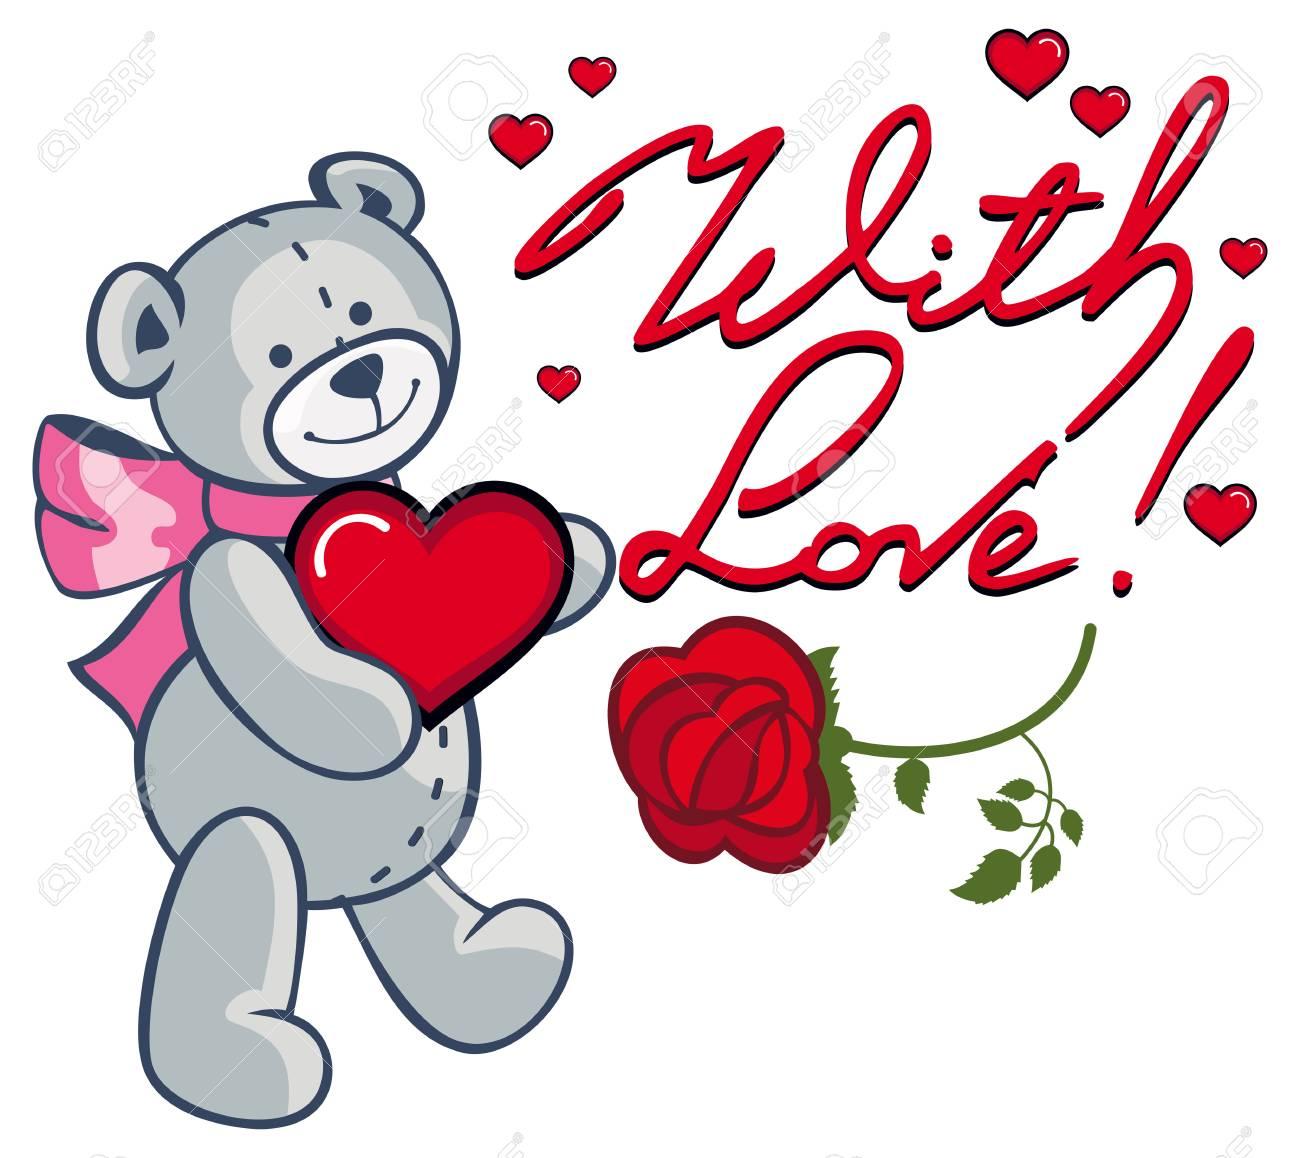 artistic written text with love and cute teddy bear holding rh 123rf com